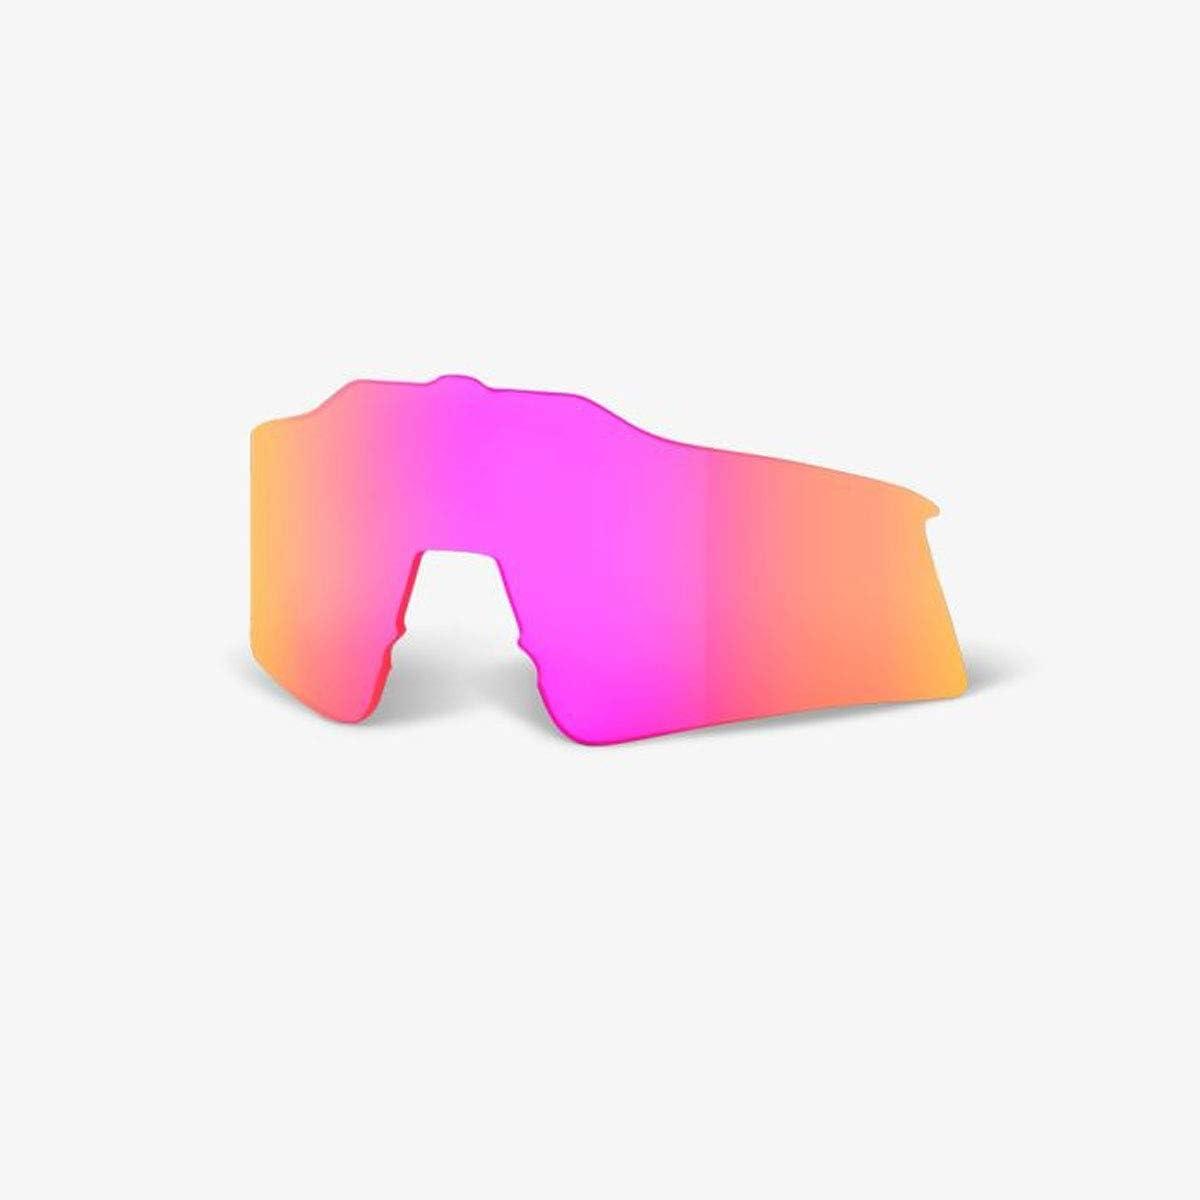 62002 HiPER 100/% Percent Speedcraft SL Goggle Replacement Lenses